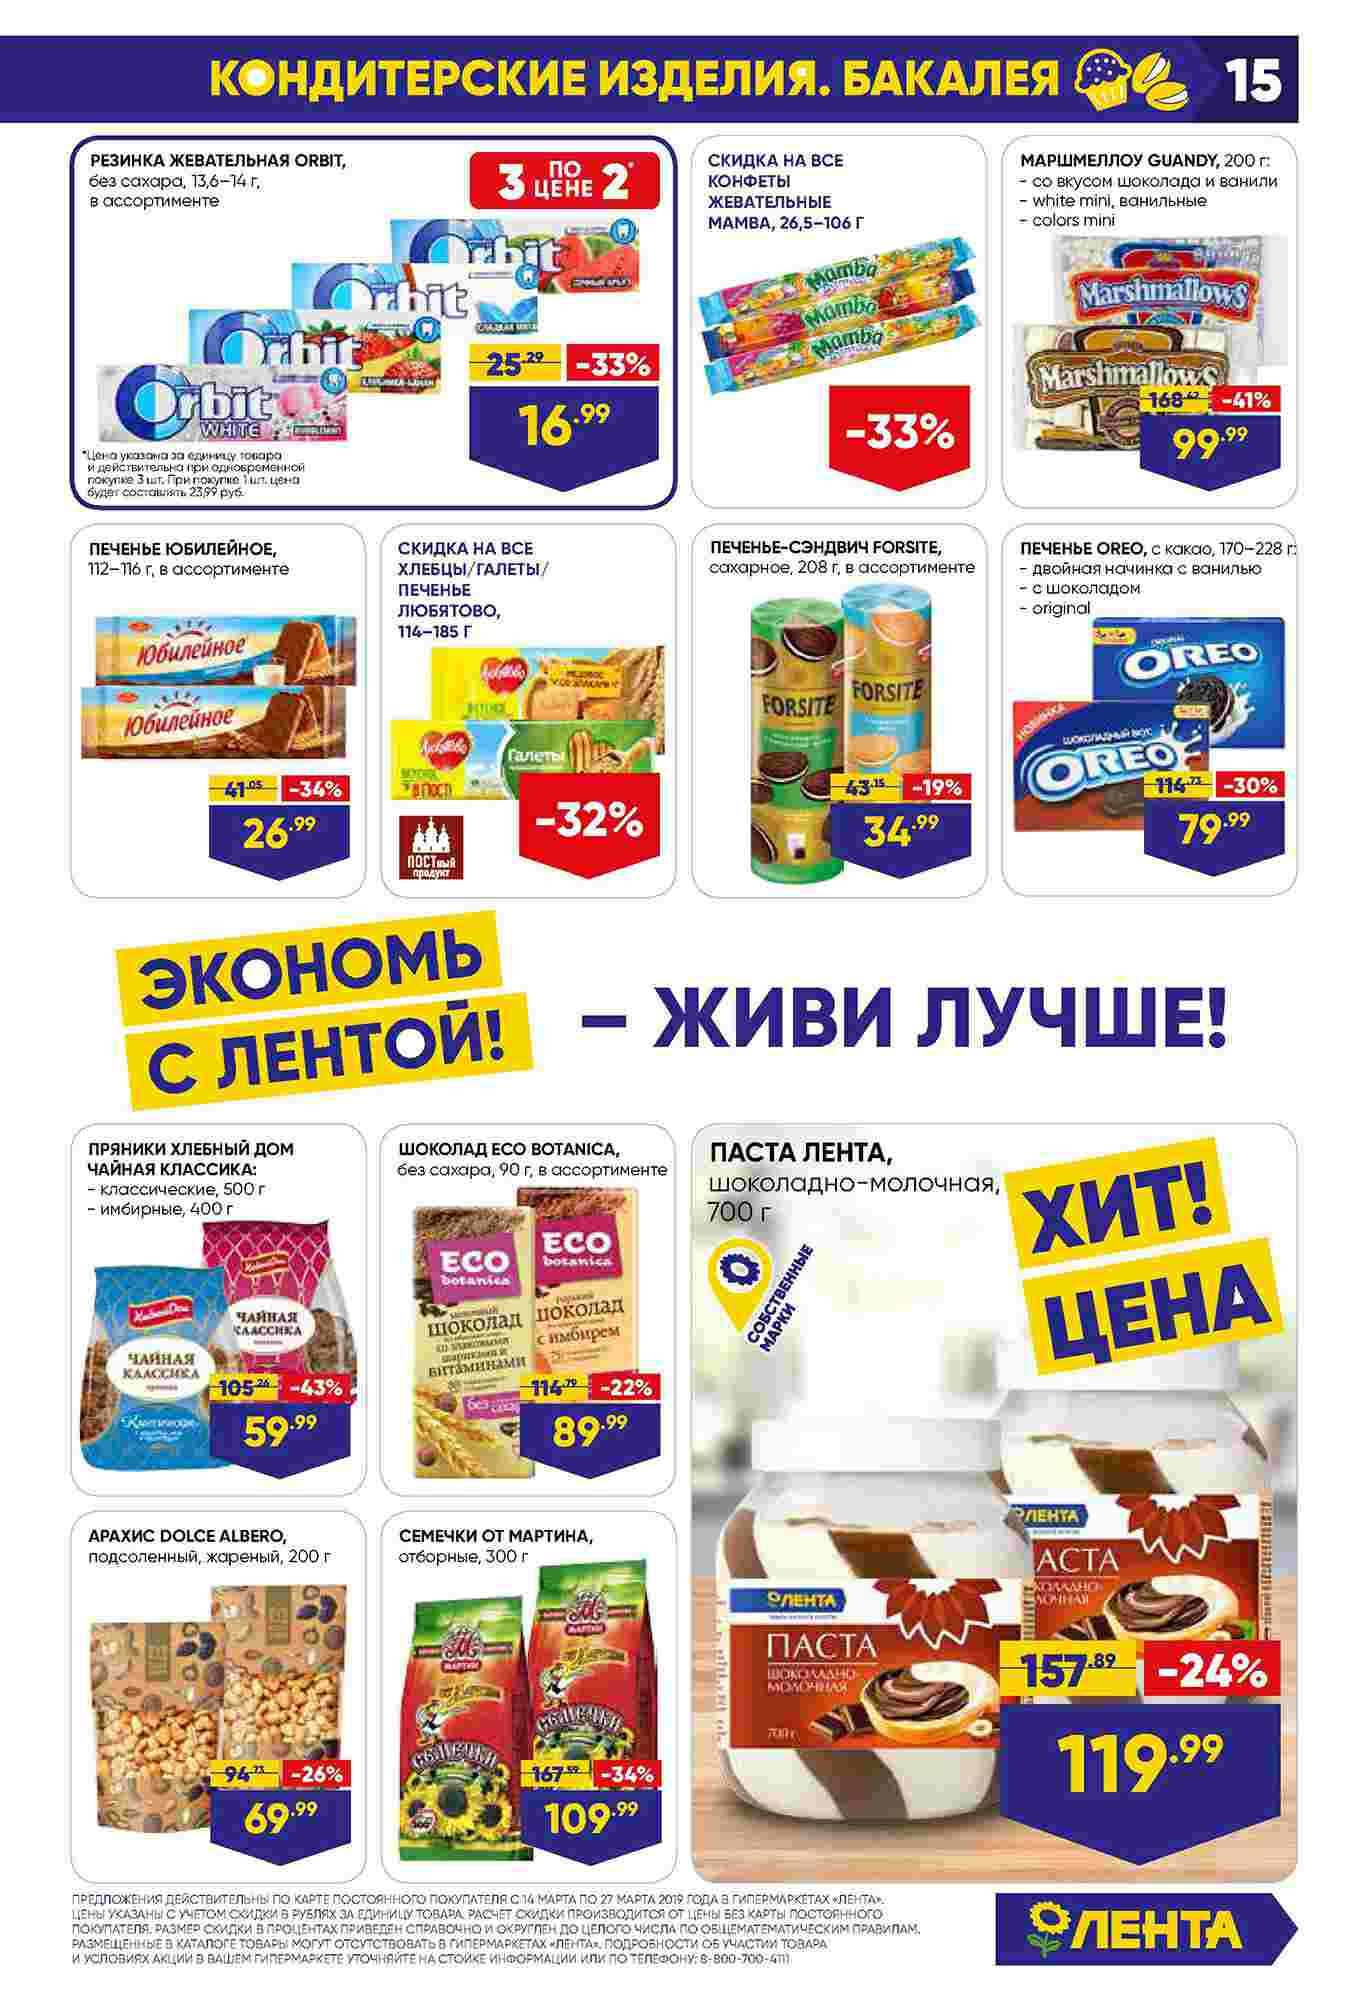 Каталог Лента гипермаркет 14-27.03.2019 стр. - 0001 - 0015